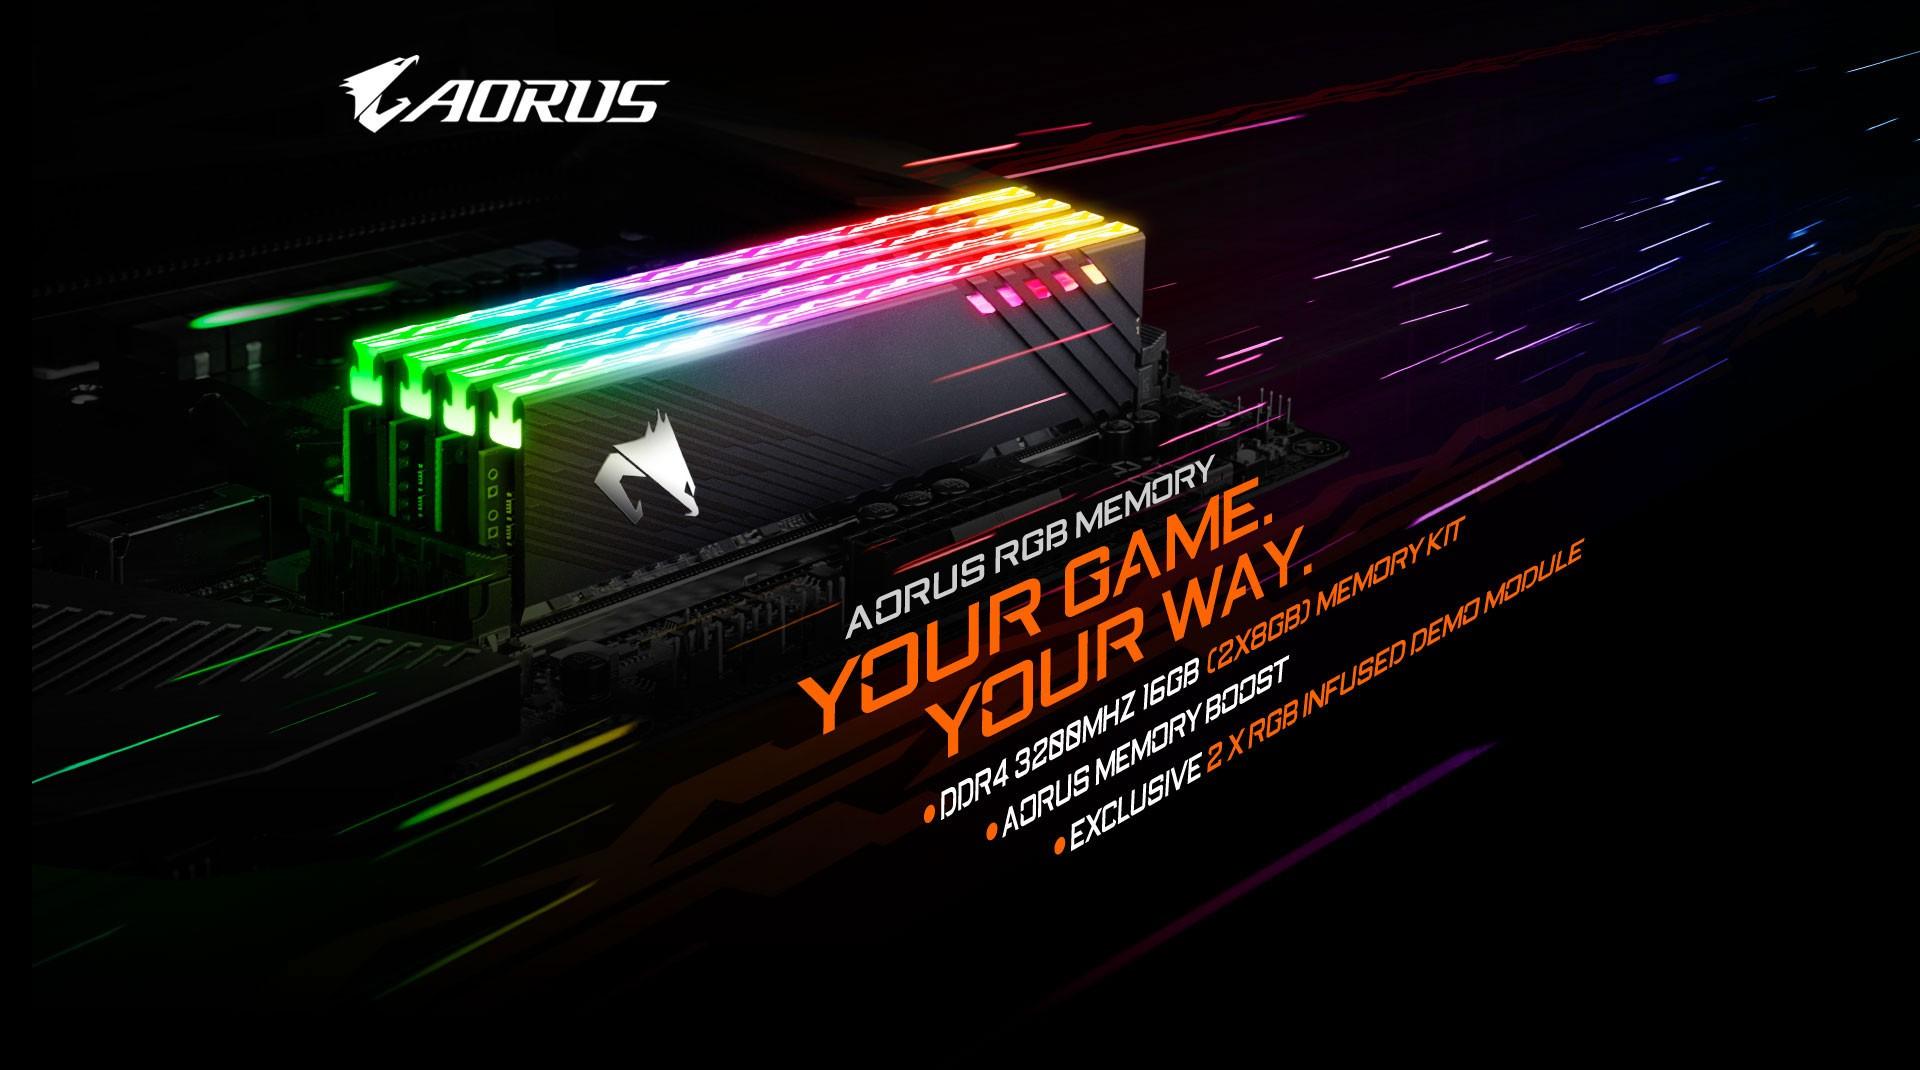 Ram Gigabyte AORUS RGB Memory 16GB (2x8GB) 3200MHz (With Demo Kit)